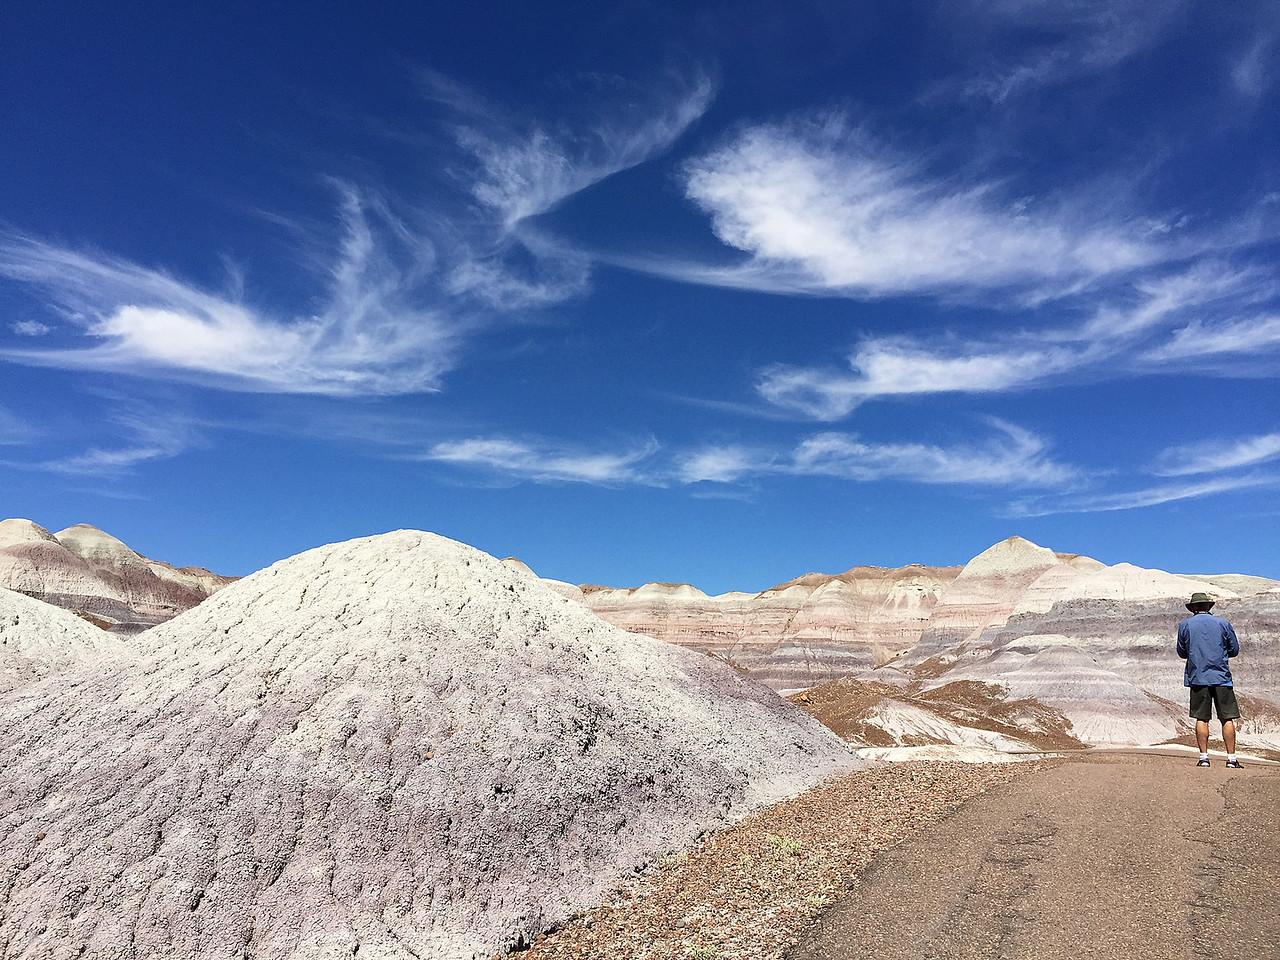 This is Teddie's photo taken as I start down the Blue Mesa Trail.